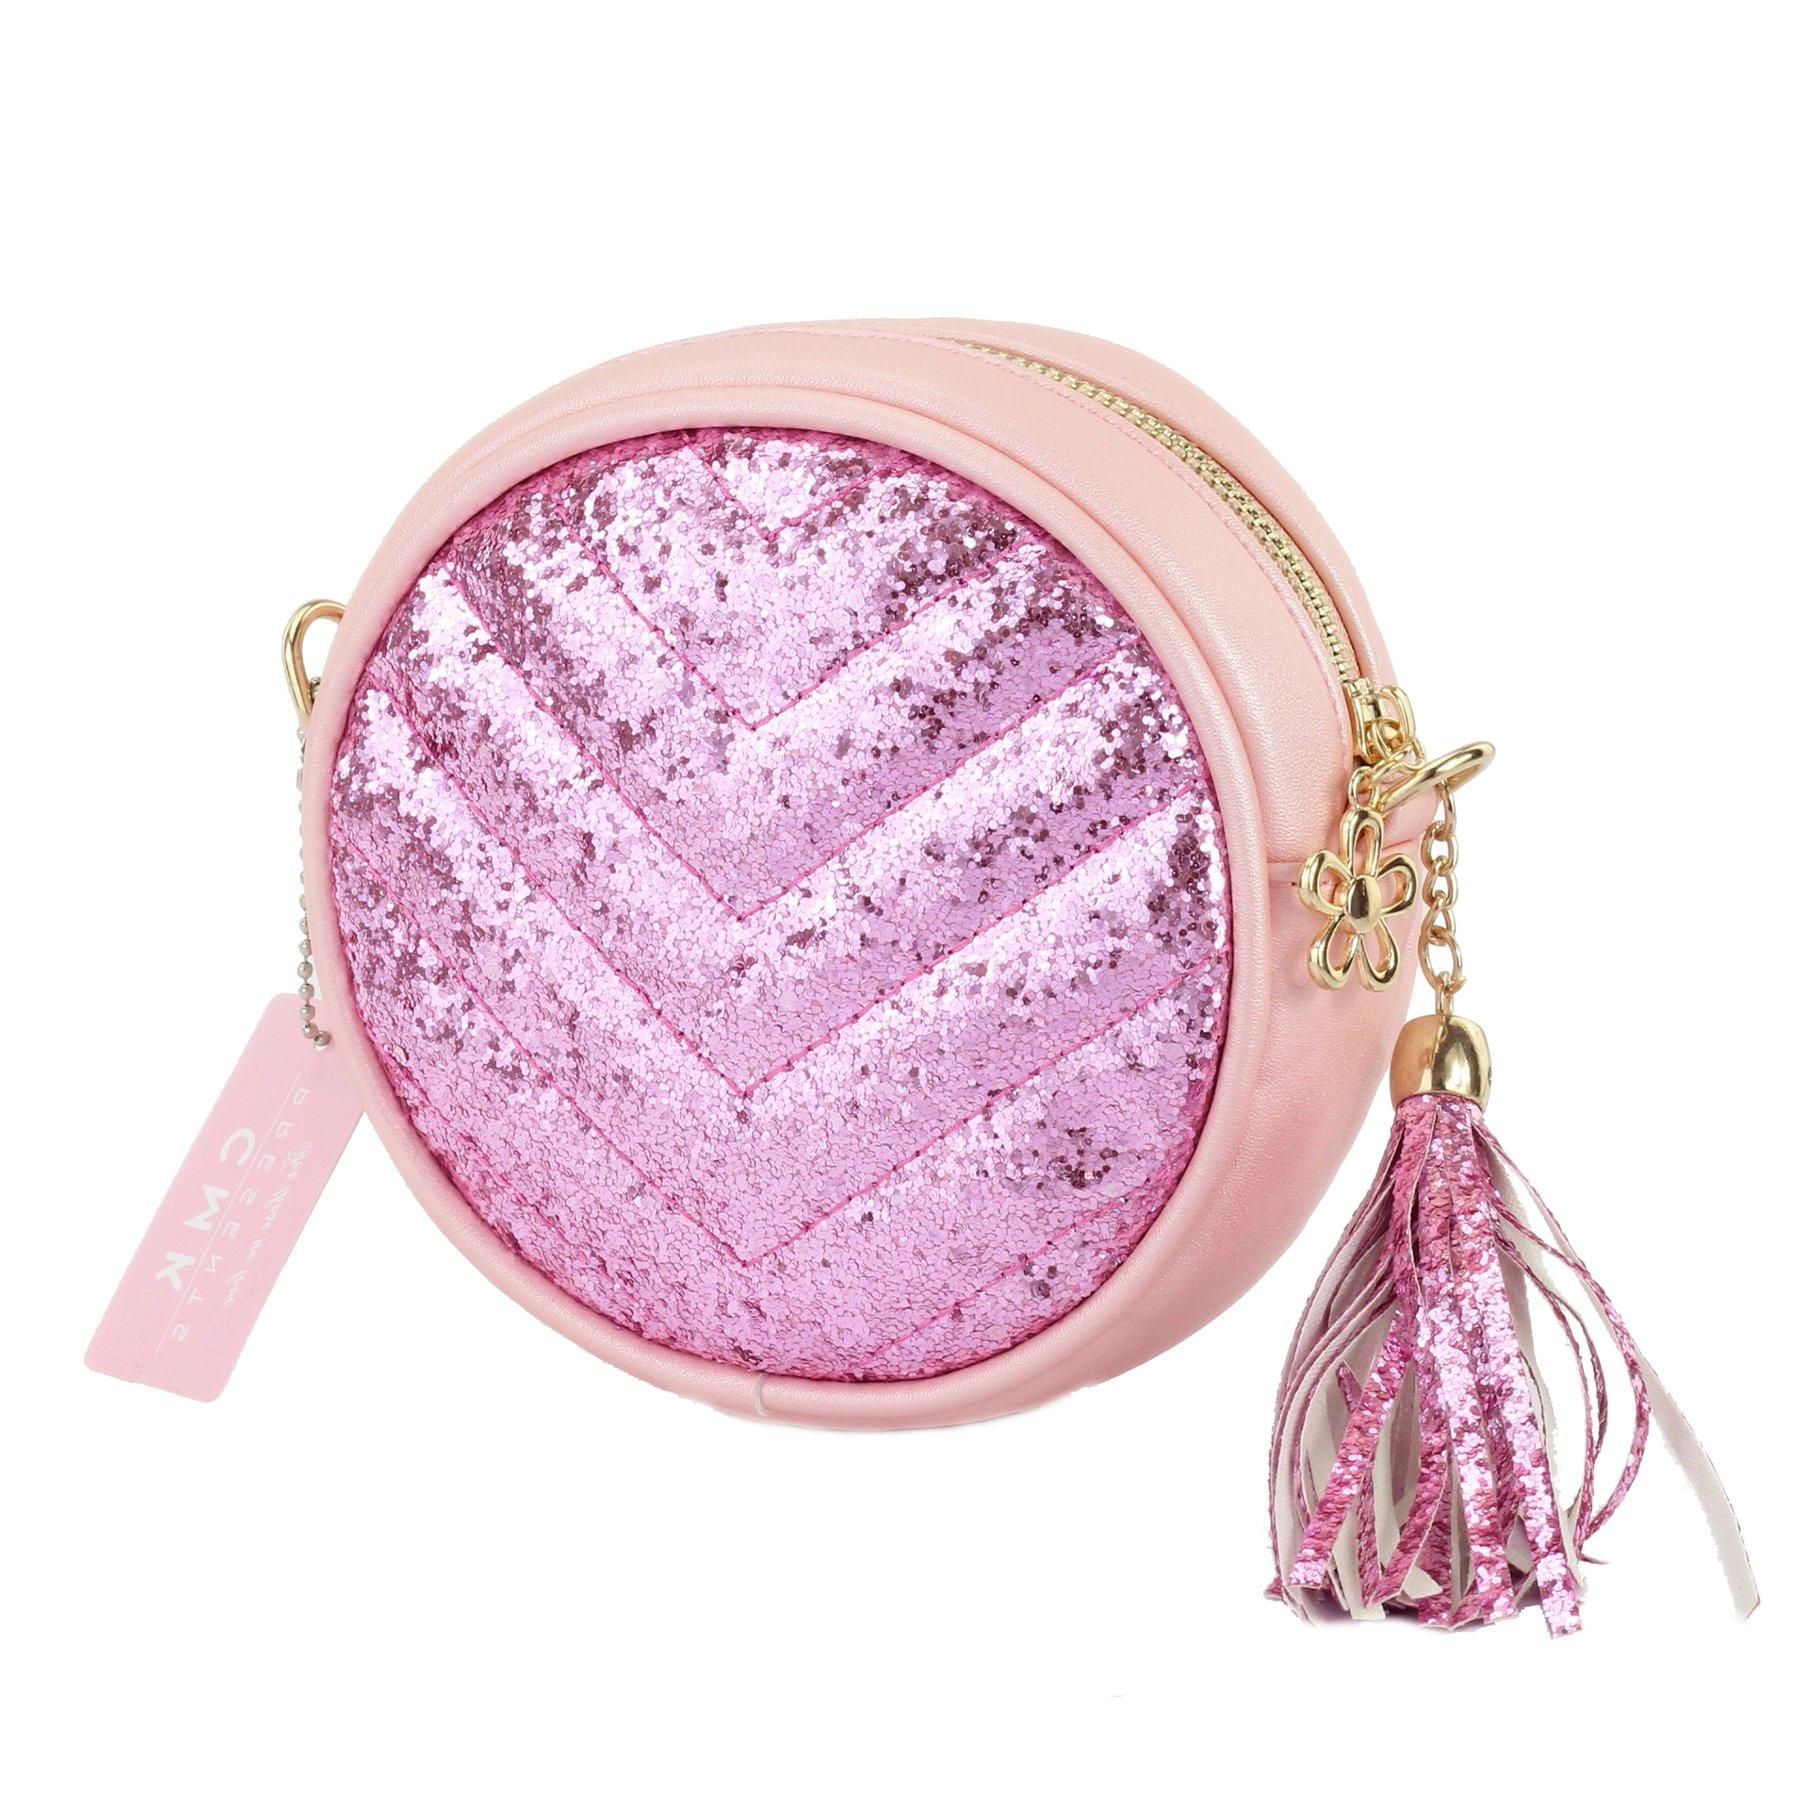 CMK Trendy Kids Girls' Round Purse with Tassel Small Handbag Princess Crossbody Fringe Bag Kids Shoulder Purse (82002_Glitter Pink)